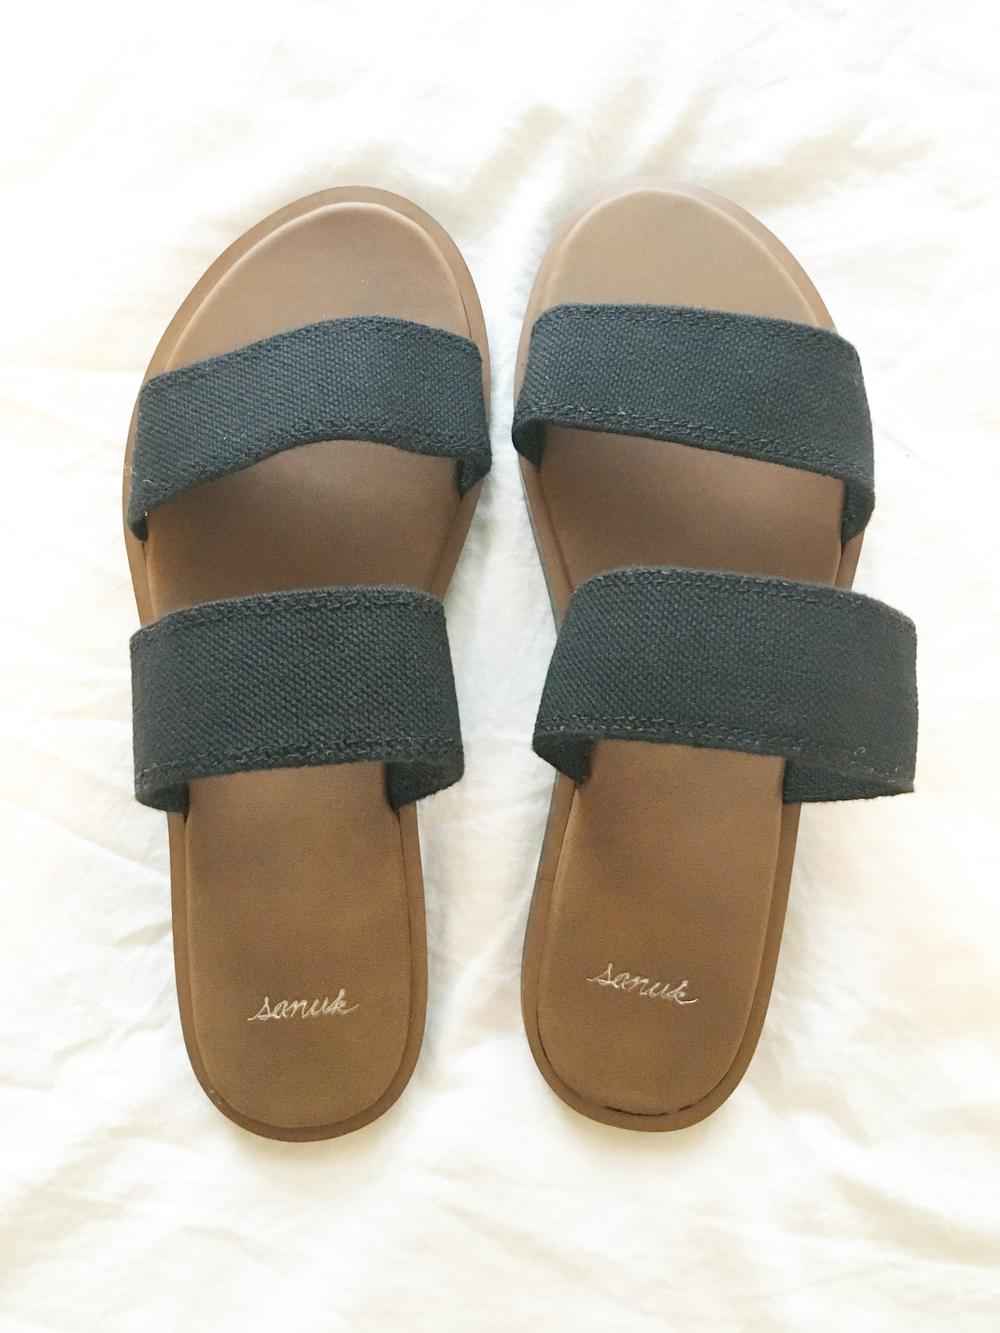 Sanuk Sandals.jpeg